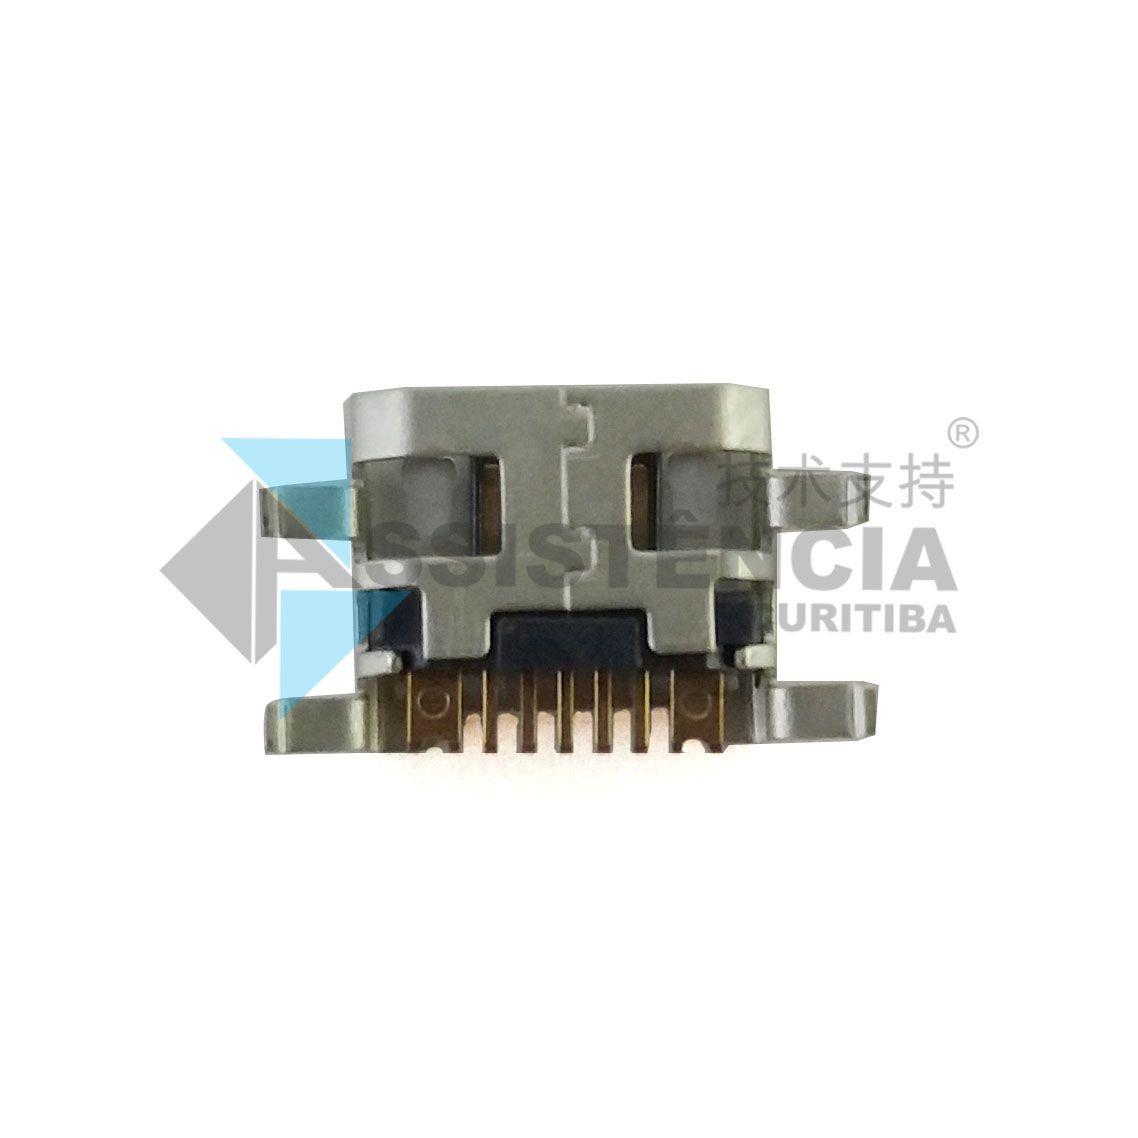 Conector De Carga Lg K10 K430 K430Tv Original